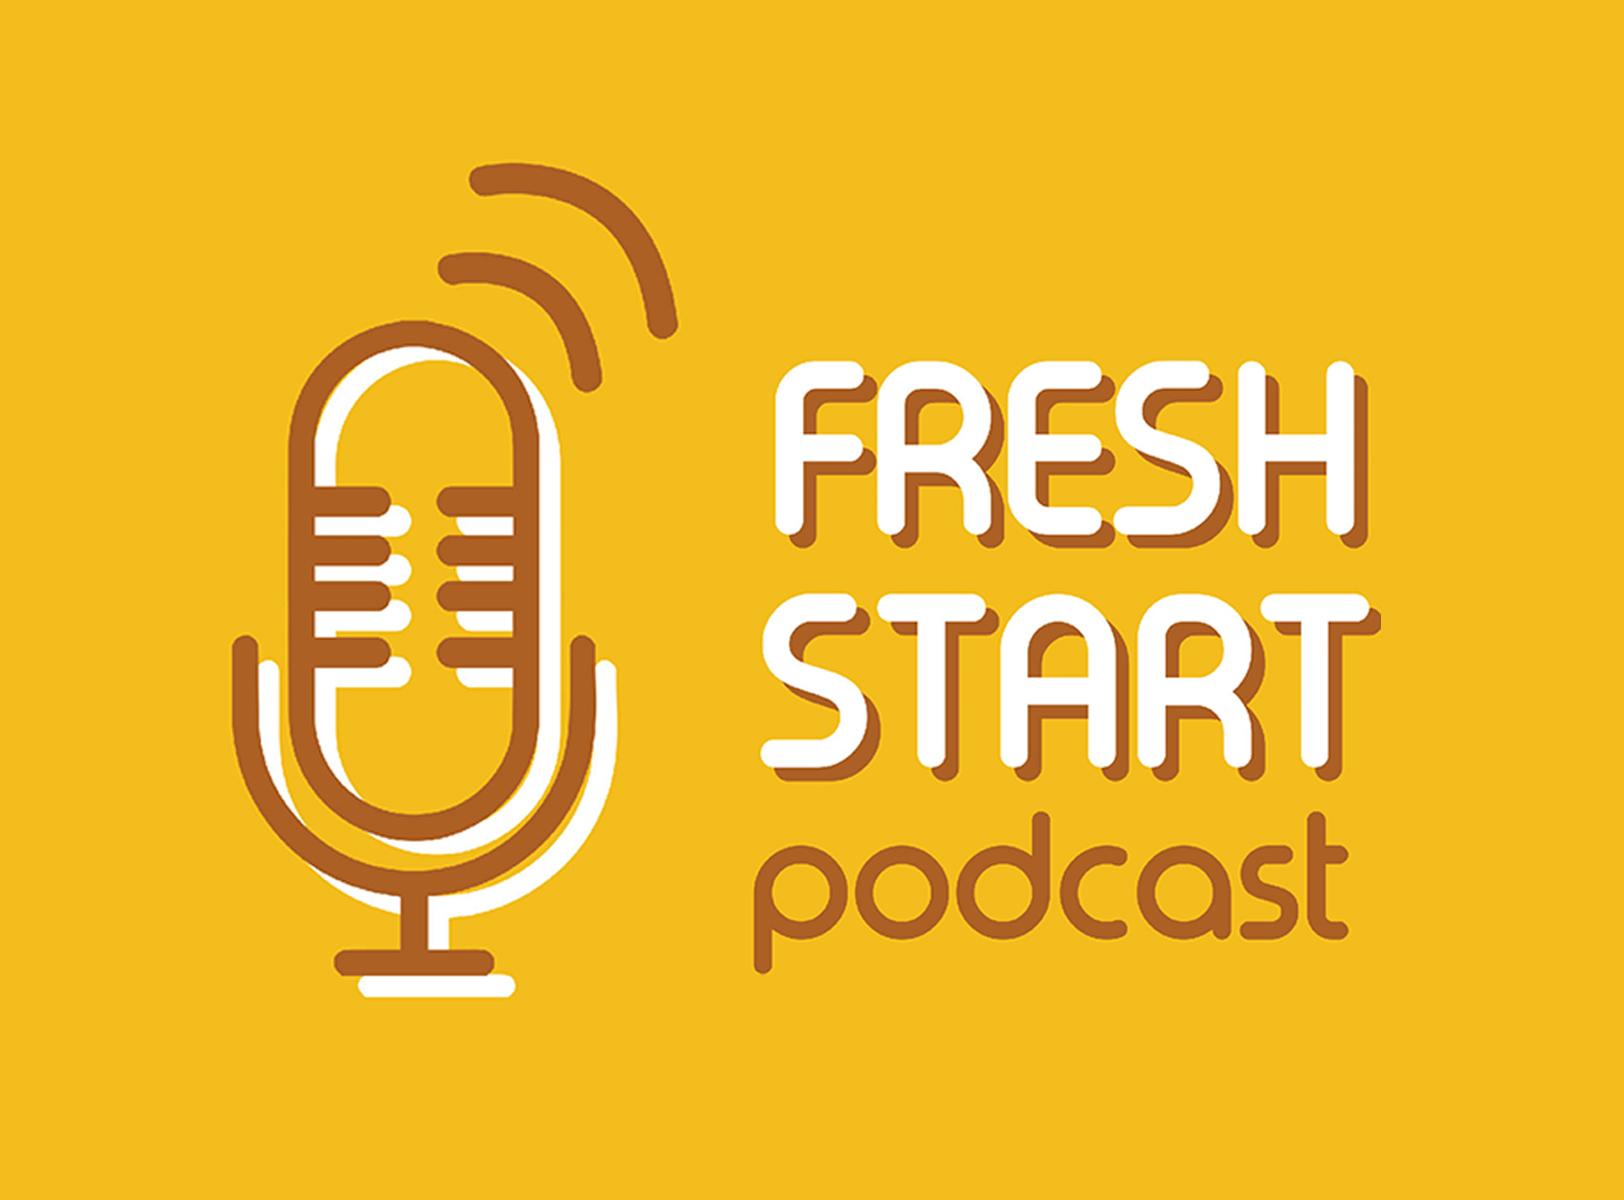 Fresh Start: Podcast News (5/20/2020 Wed.)